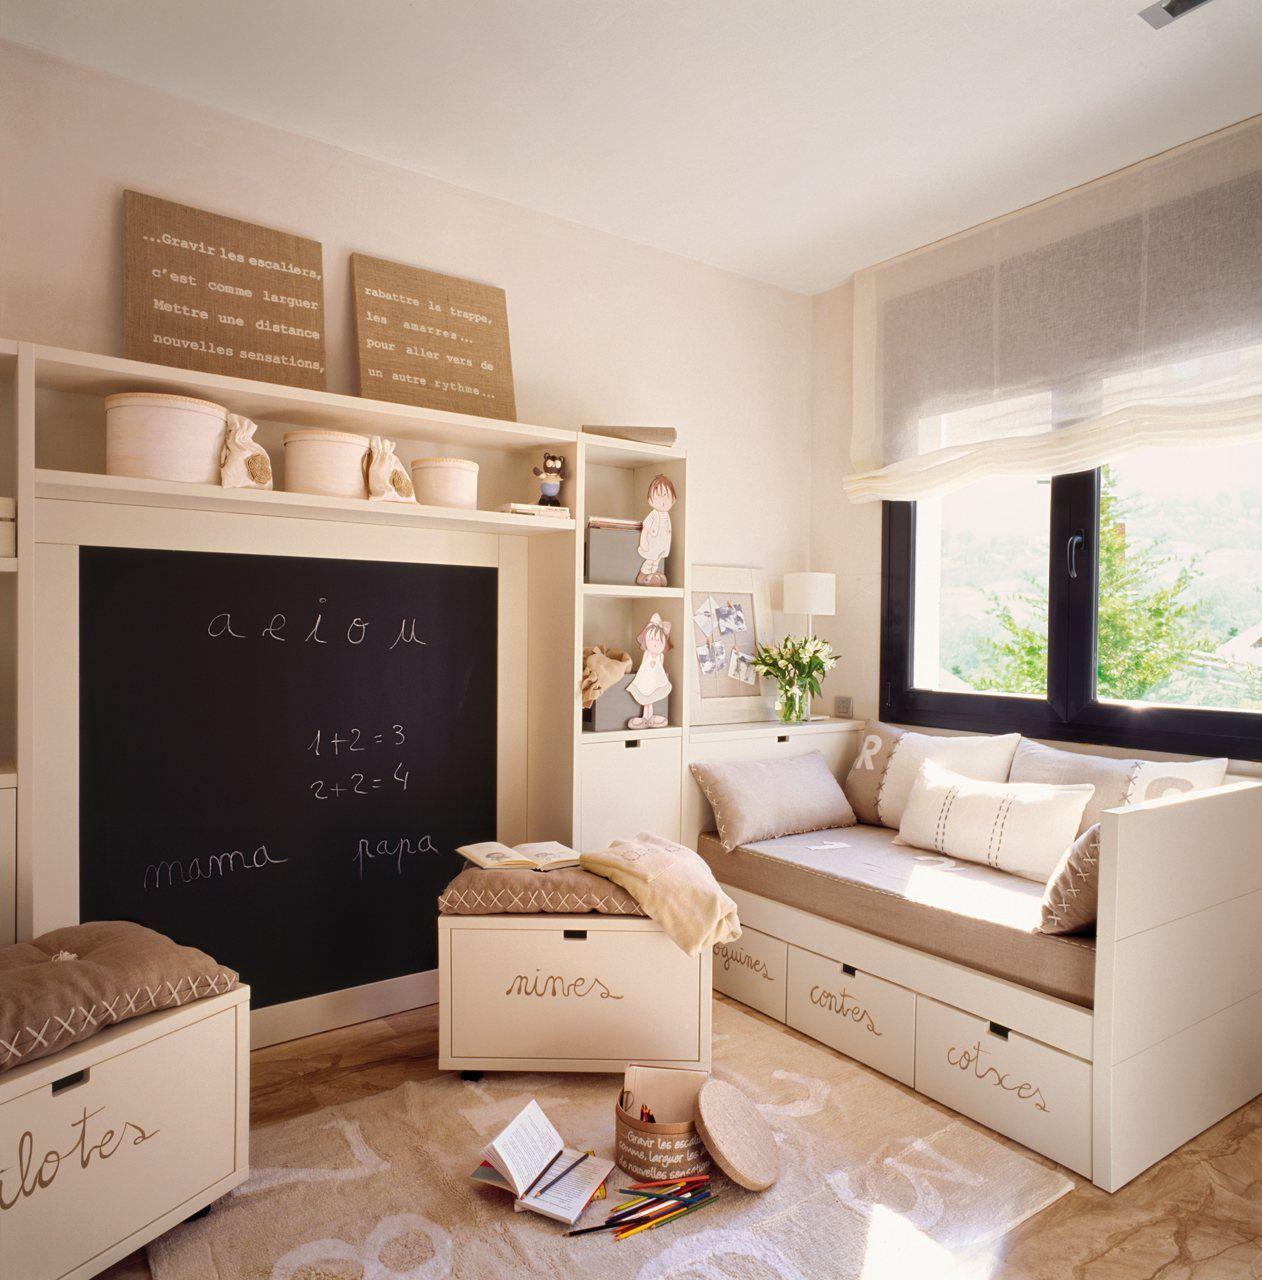 Dormitorios Infantiles Peque Os S Cales Partido Elmueble Com  ~ Dormitorios Juveniles Para Espacios Muy Pequeños